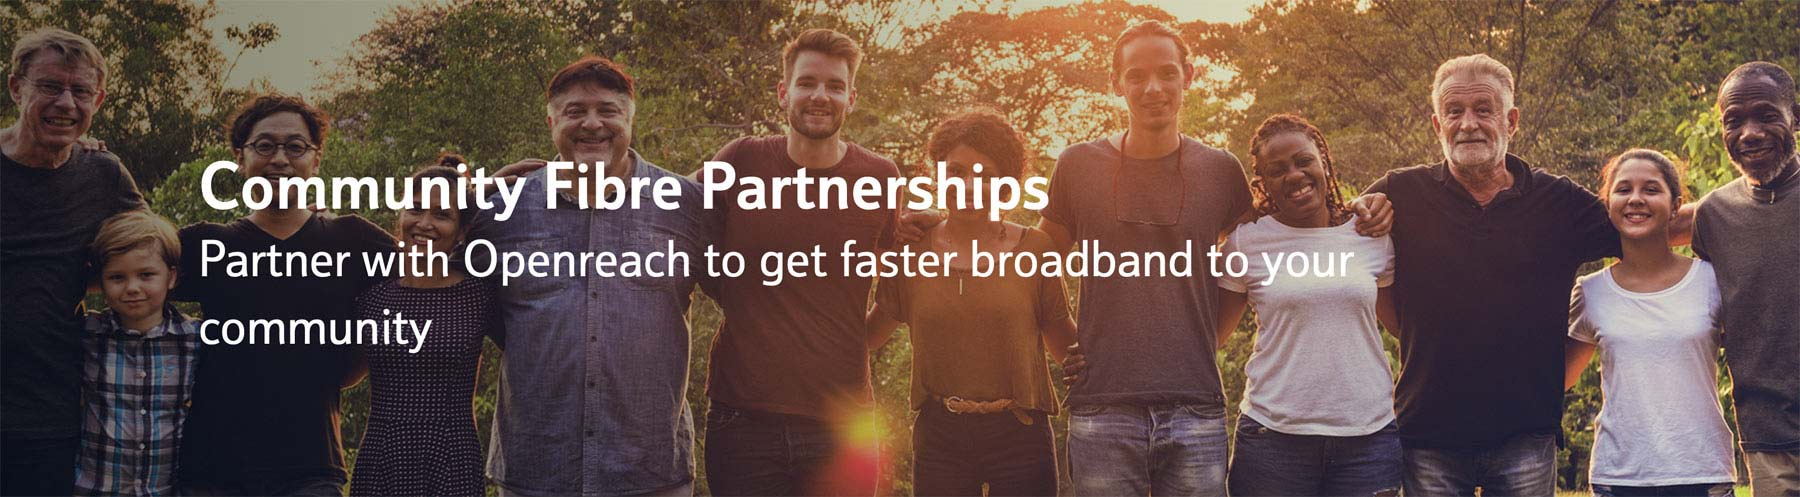 Openreach community partnerships